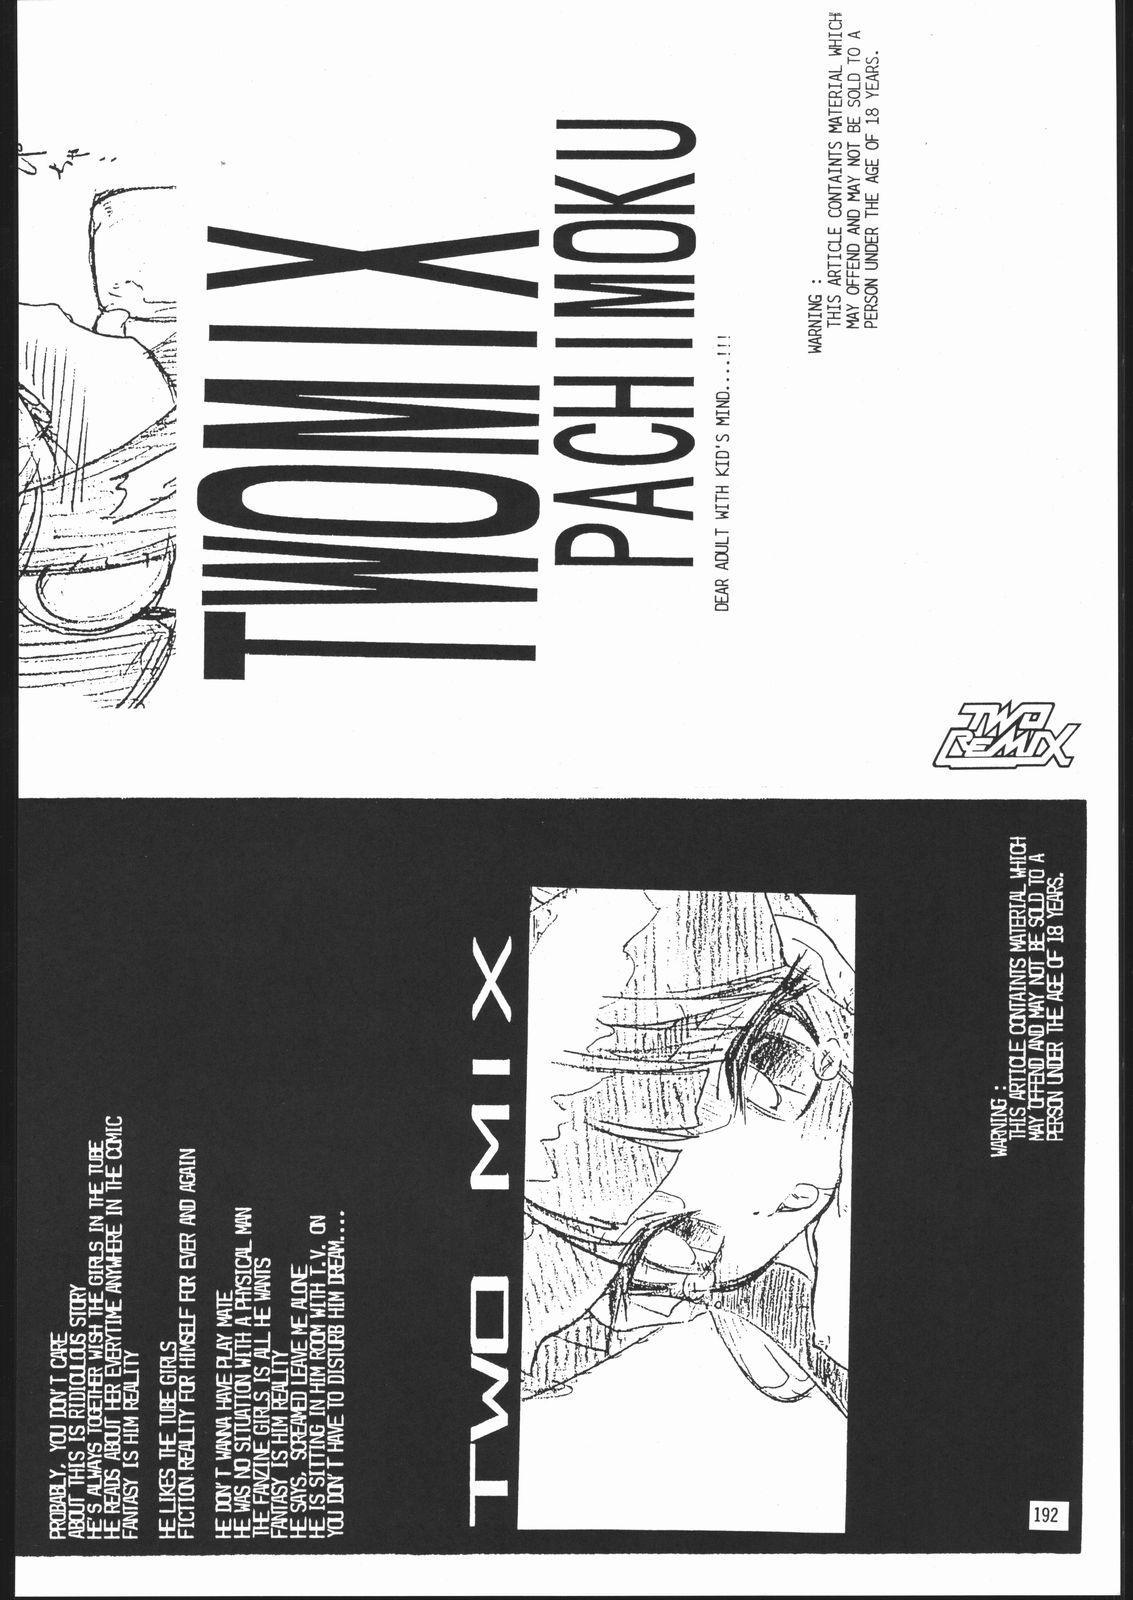 TWO REMIX 190